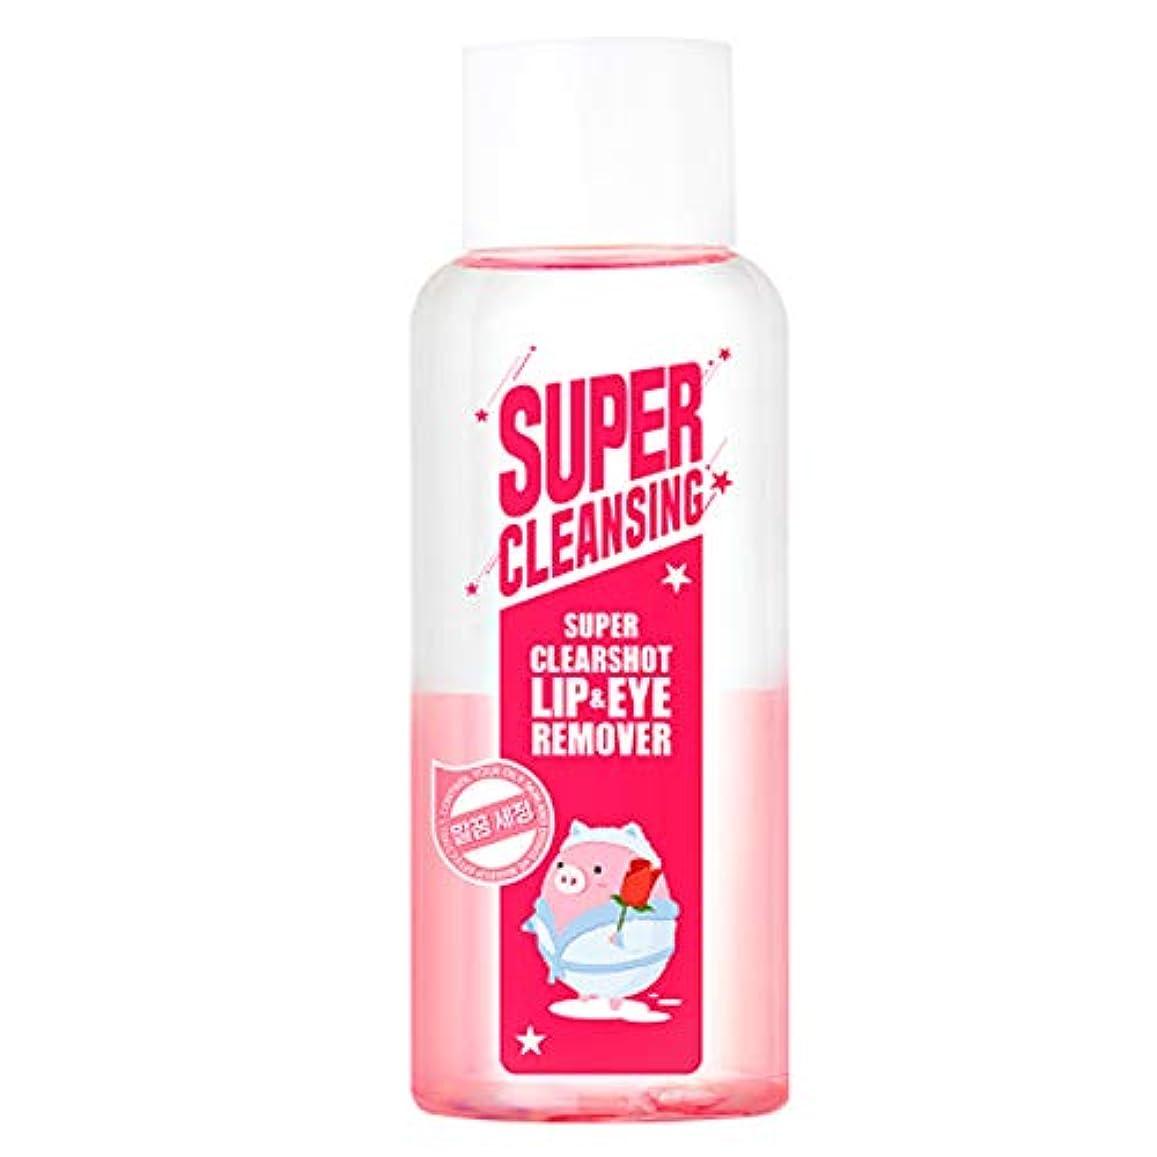 Mefactory Super Clearshot Lip&Eye Remover ミファクトリ? スーパークリアーリップ&アイリムーバー [並行輸入品]